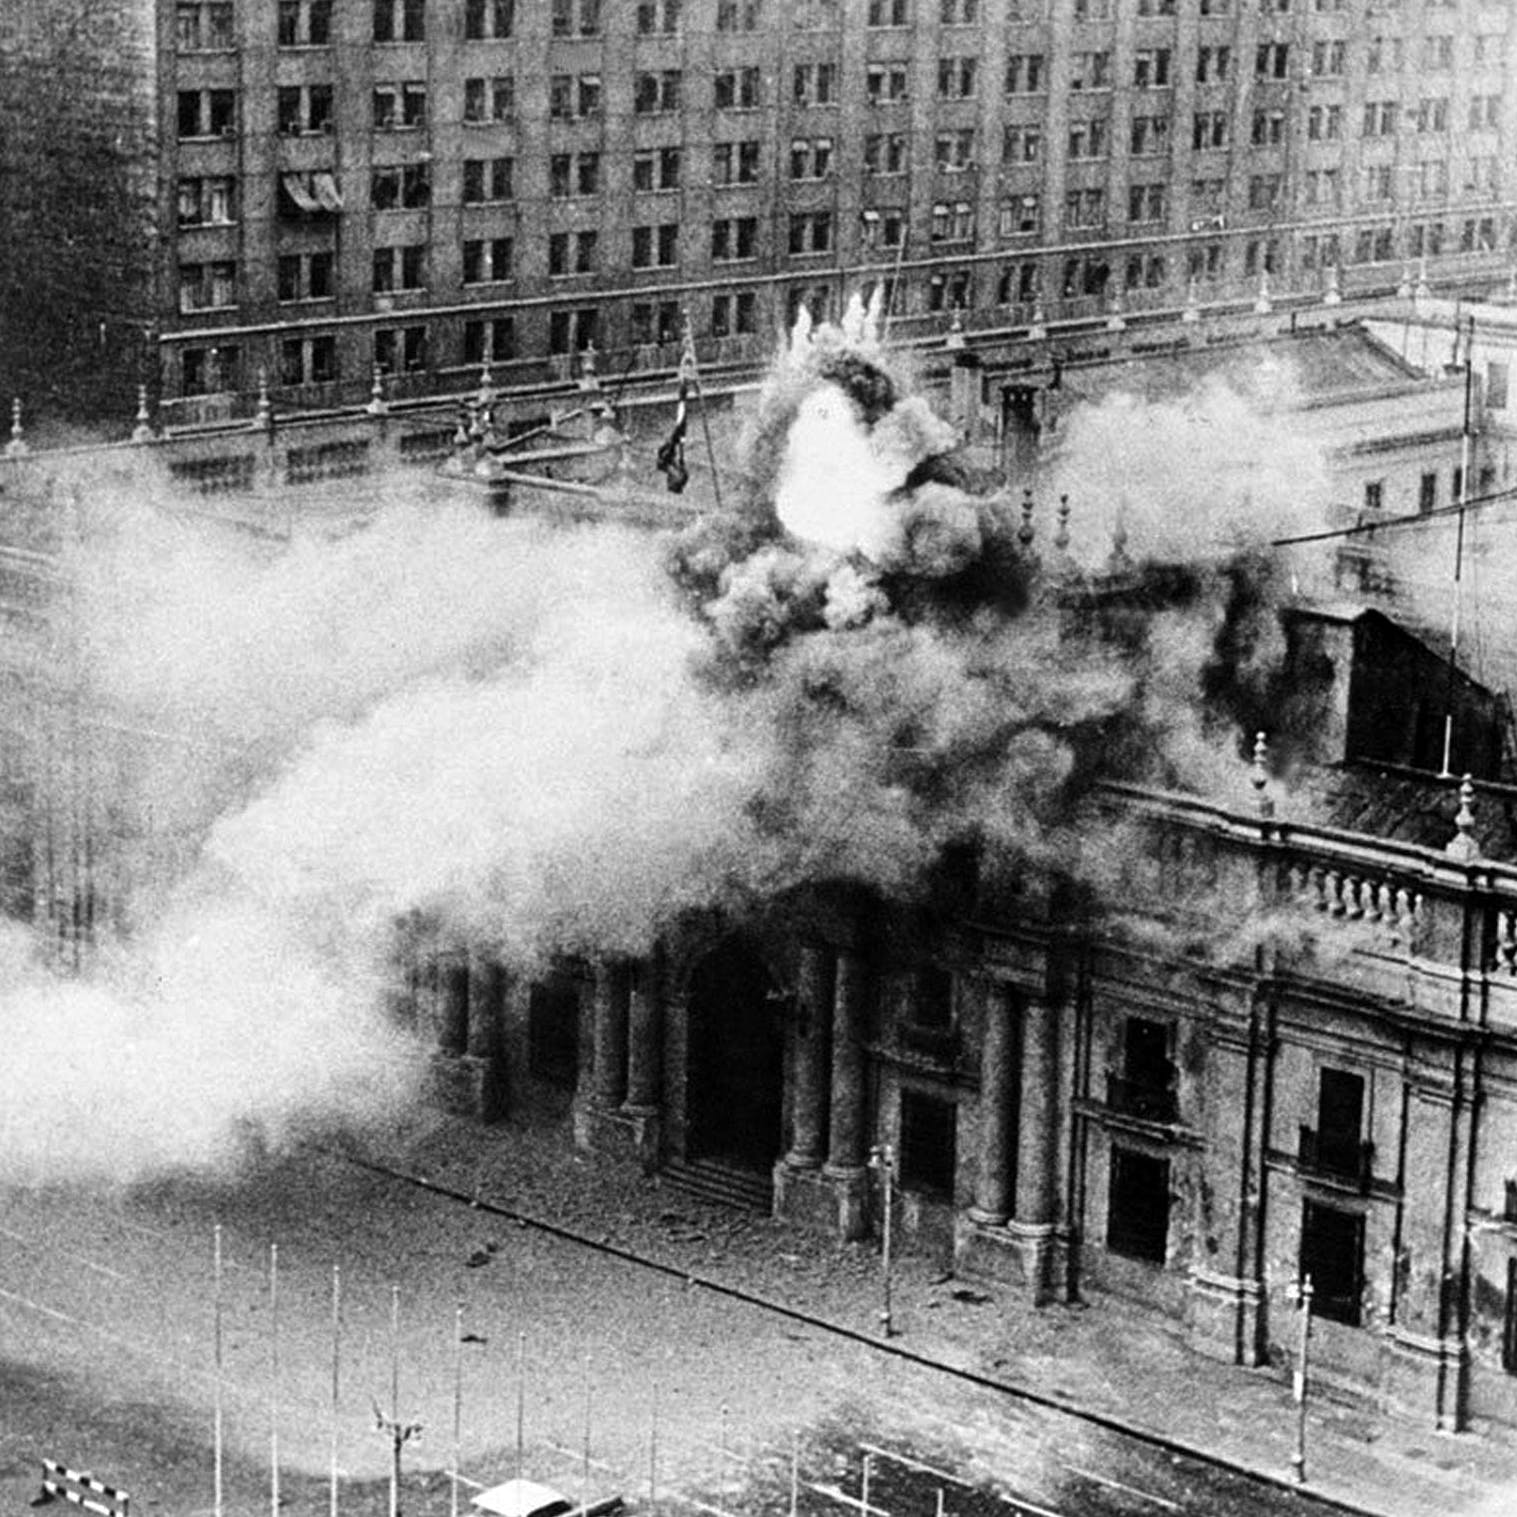 11 de Septiembre de 1973: Relato radial